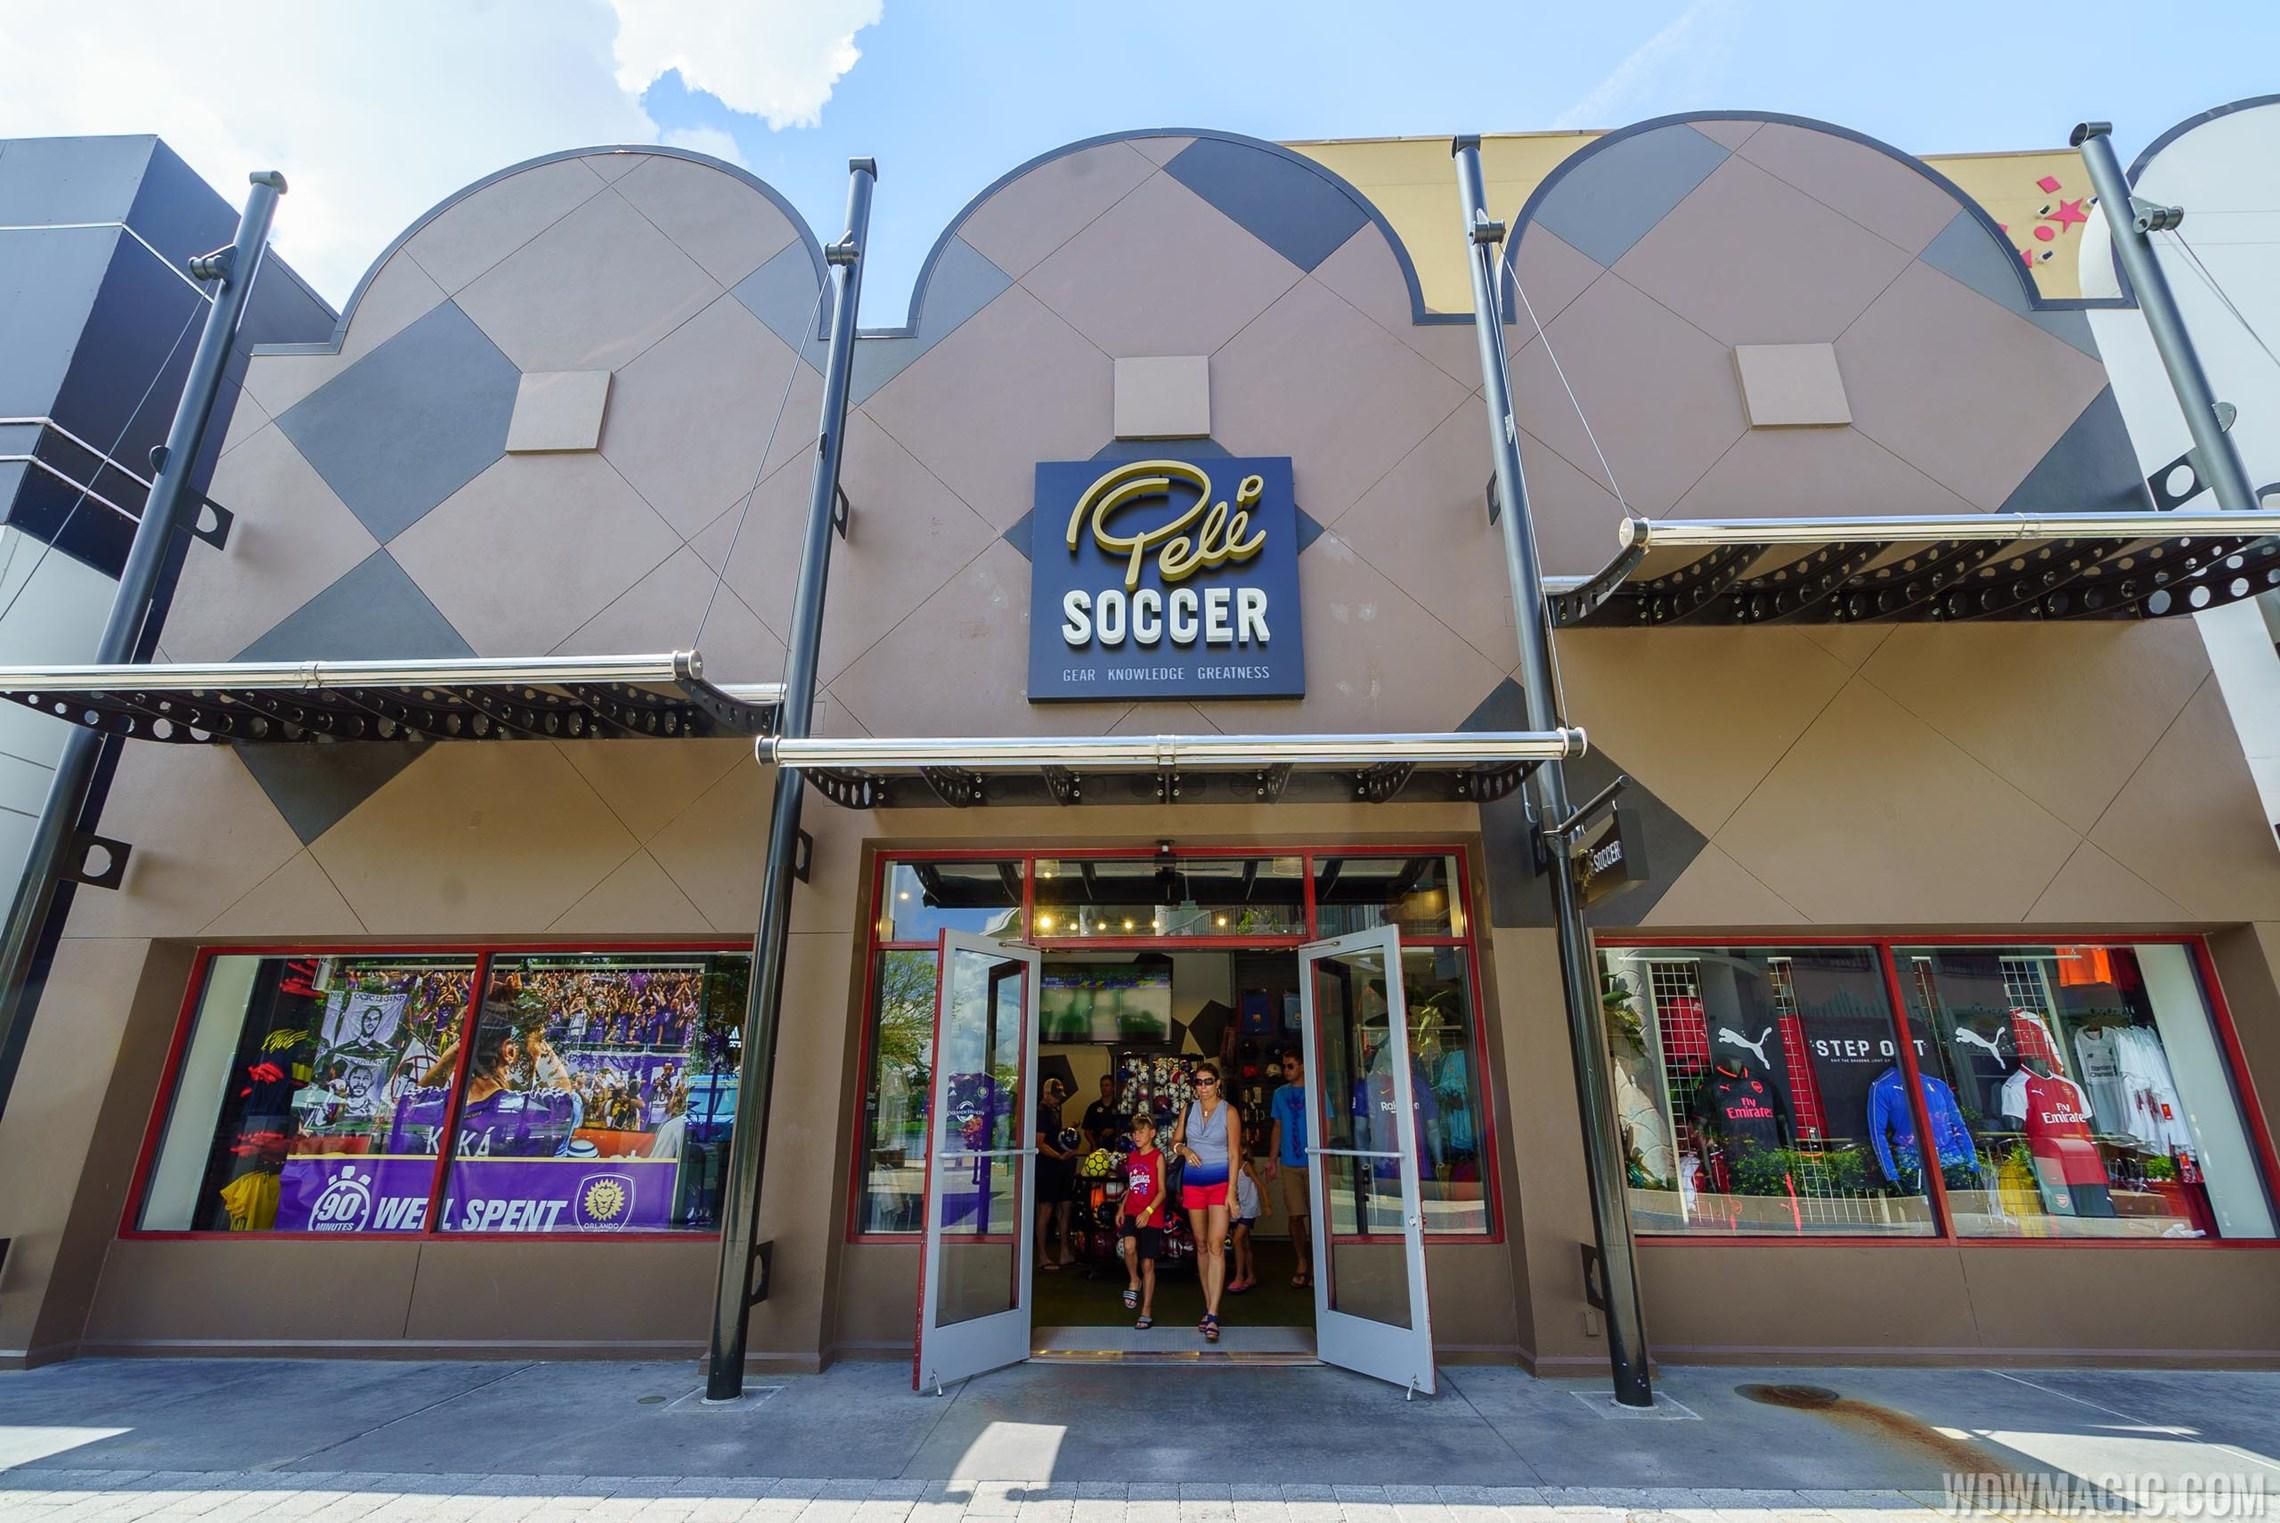 United World Soccer at Disney Springs rebranded to Pelé Soccer